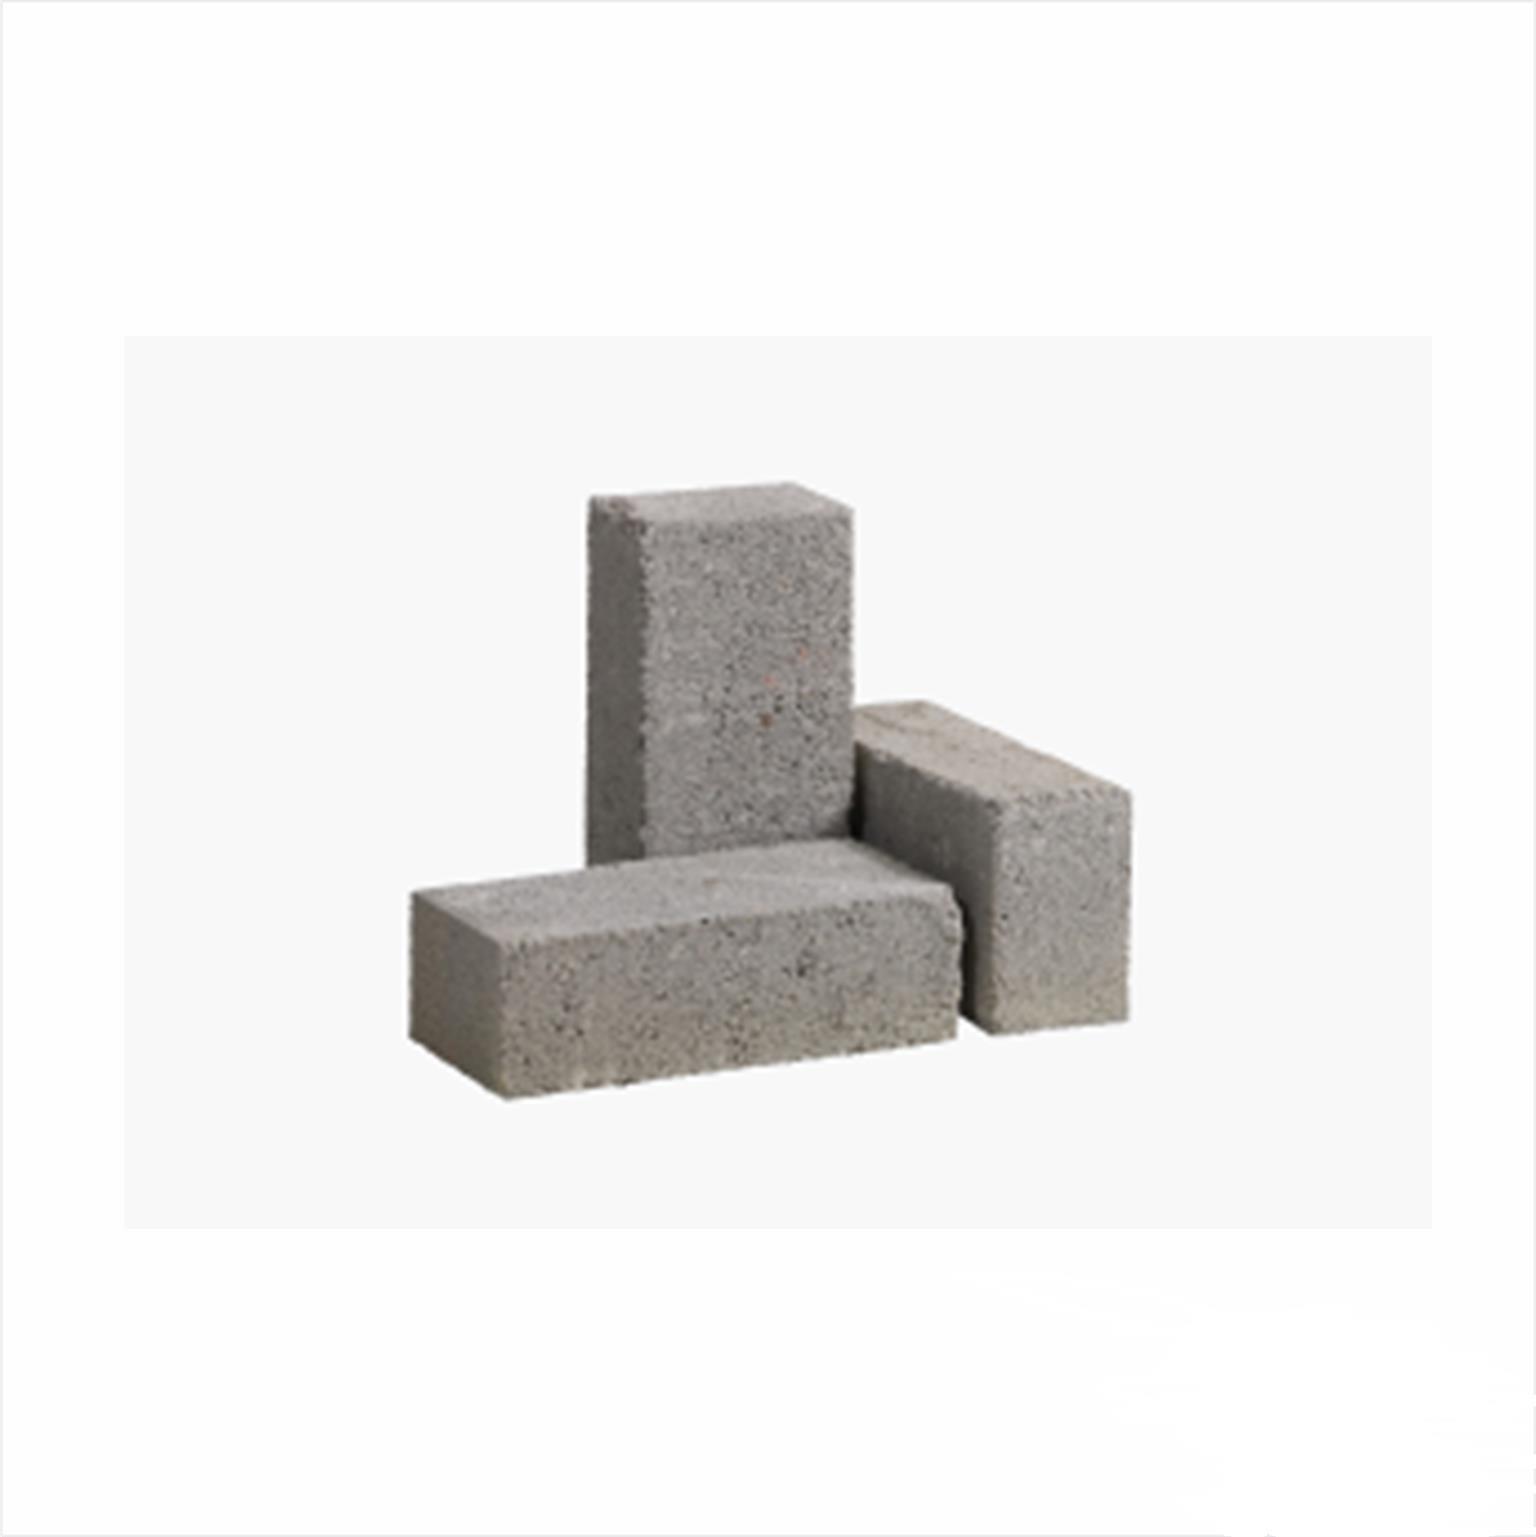 BRICKS : Cement Bricks / 1000s